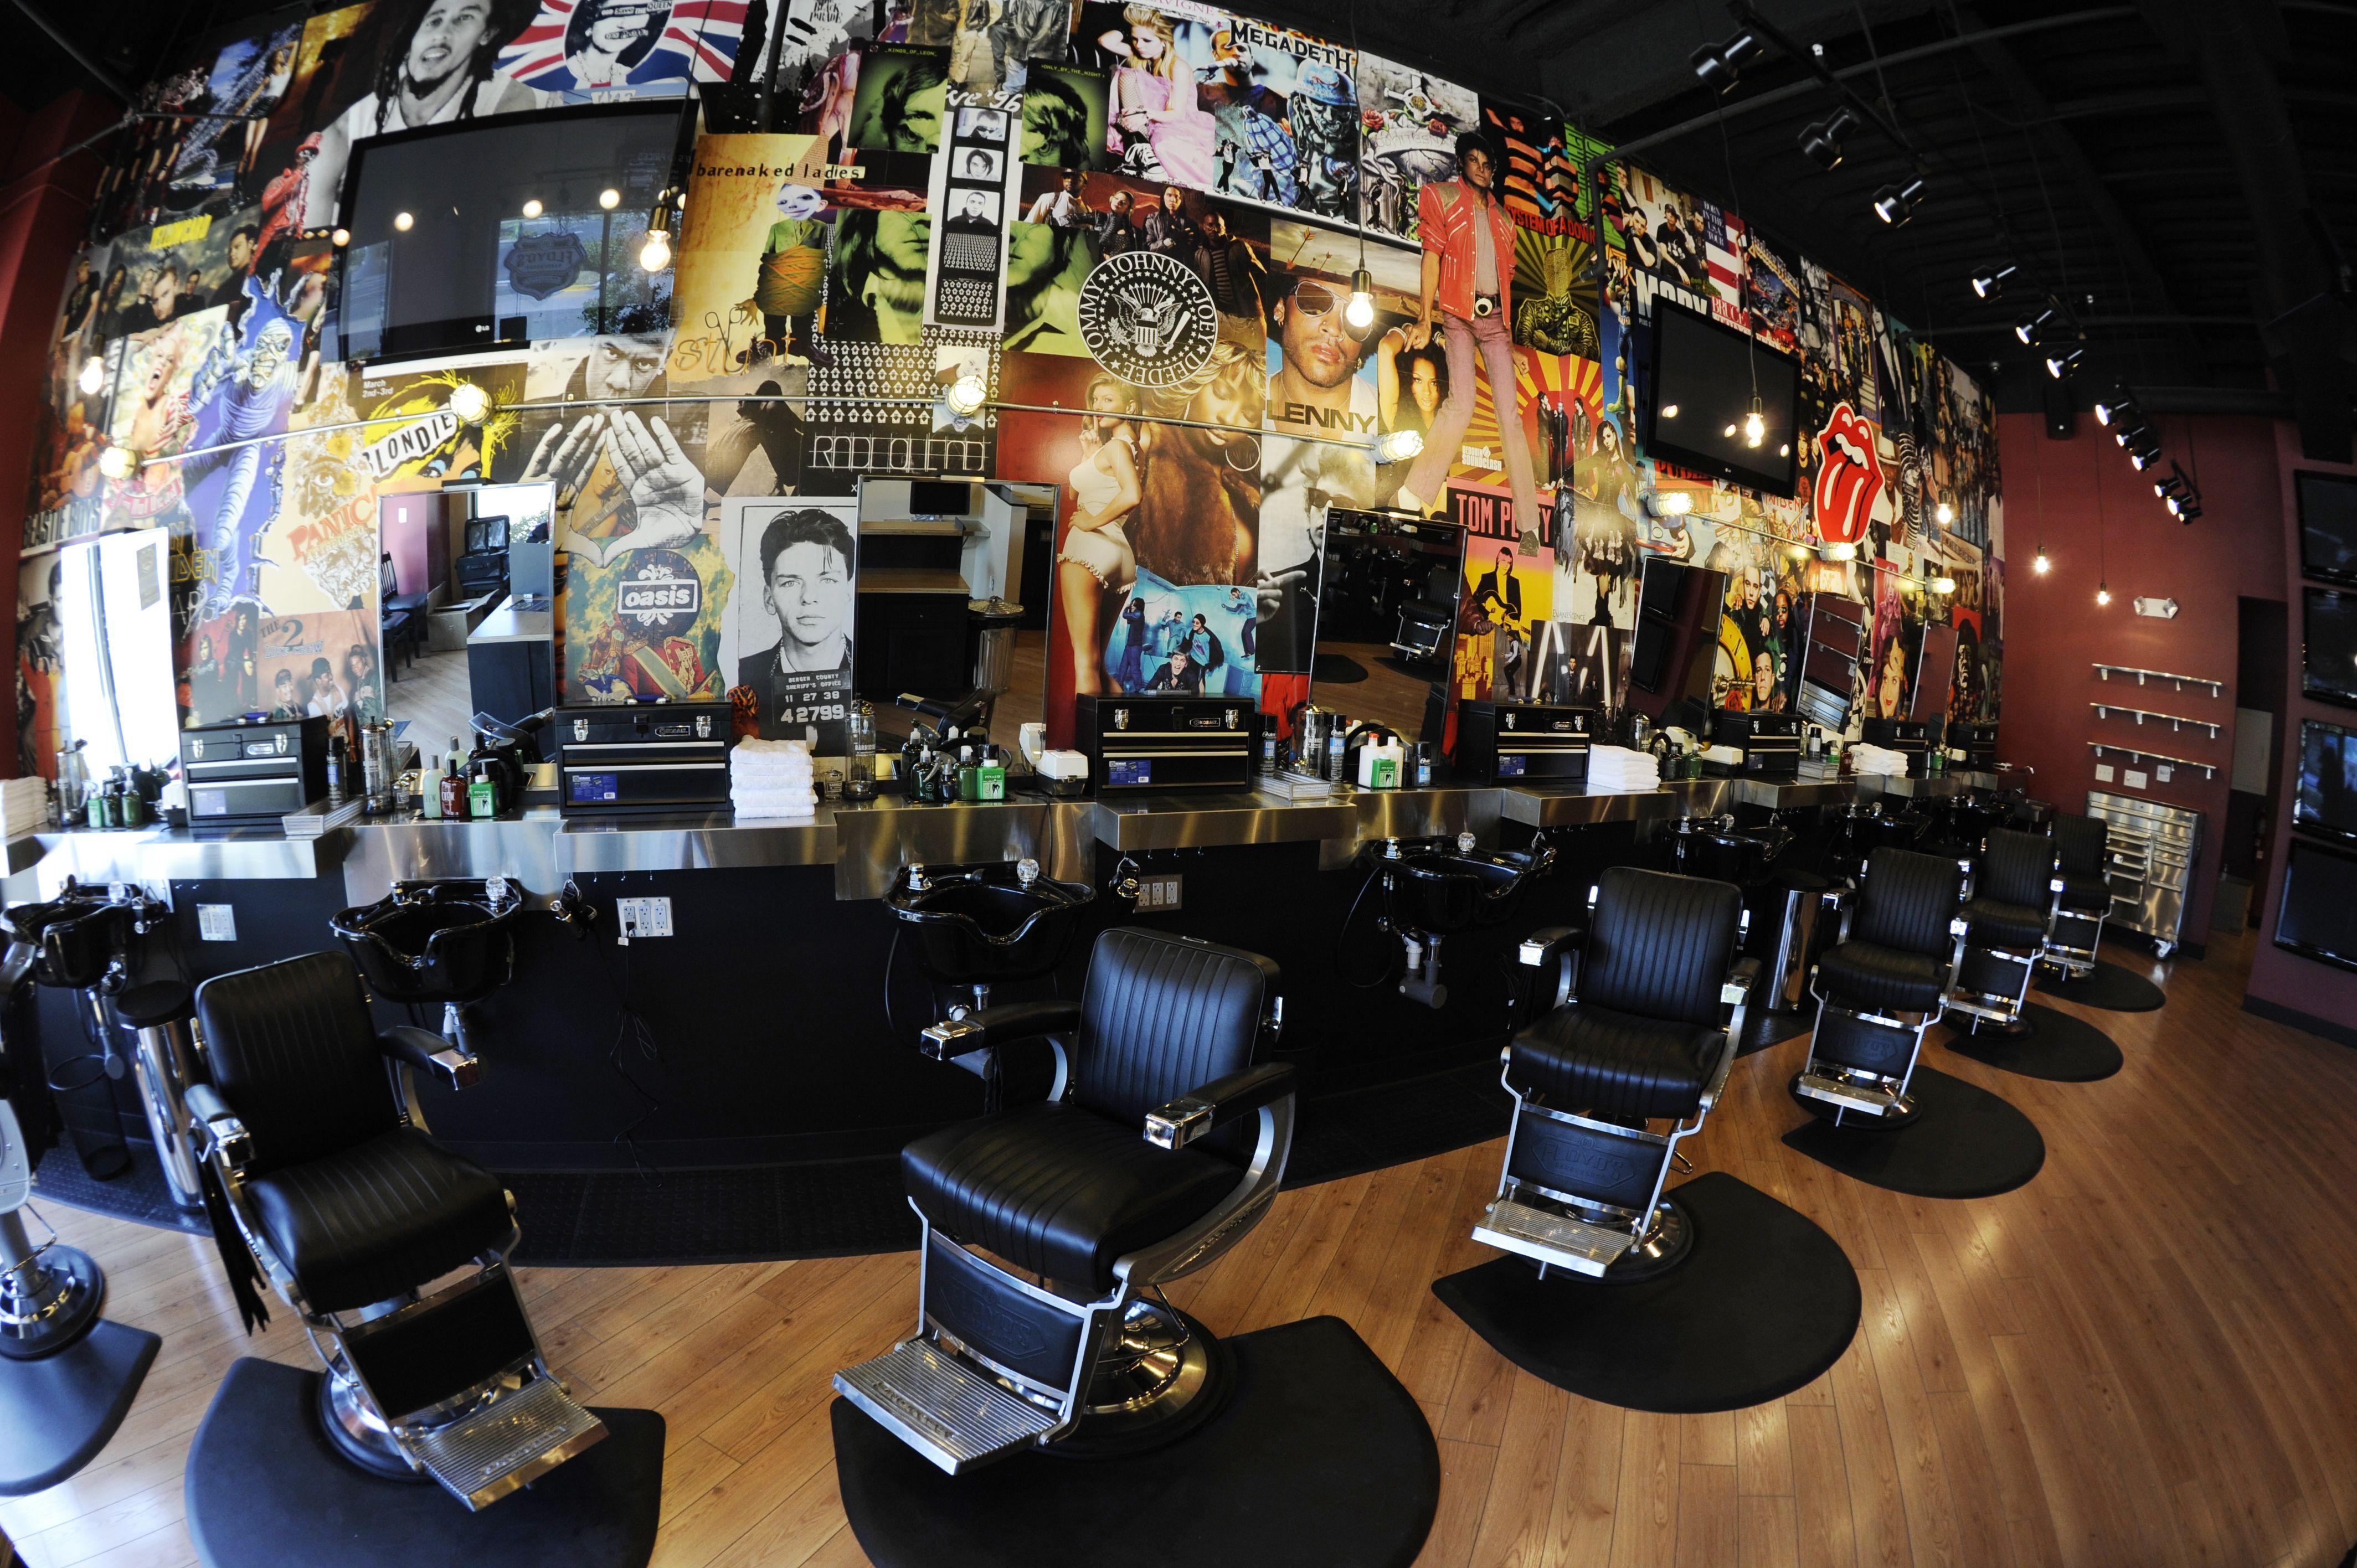 The Coolest Barbershop Around Floyd S 99 Barber Shop Mar Vista Floyd